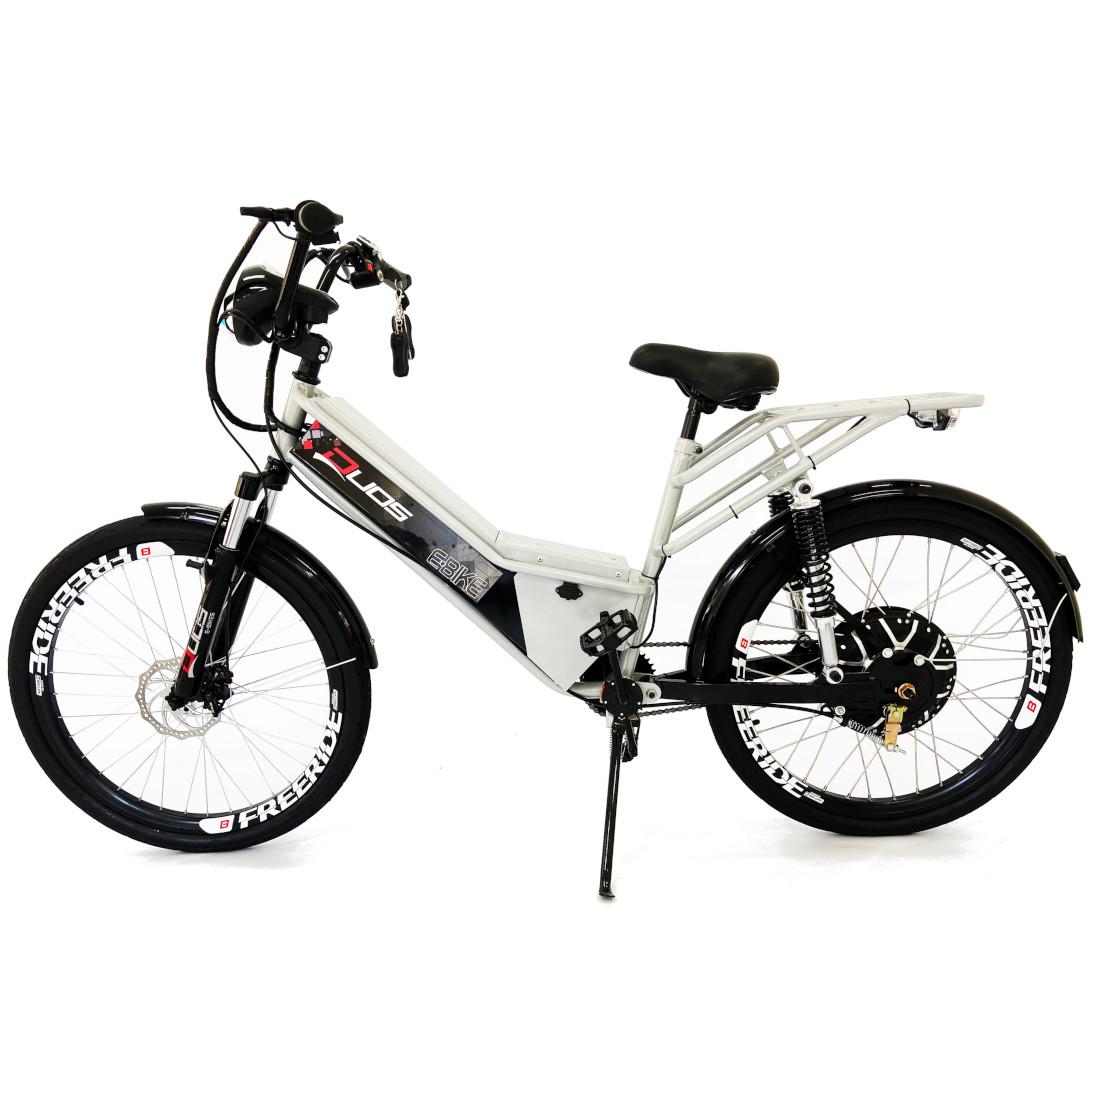 Bicicleta Elétrica Confort FULL 800W 48V 15Ah Cor Prata